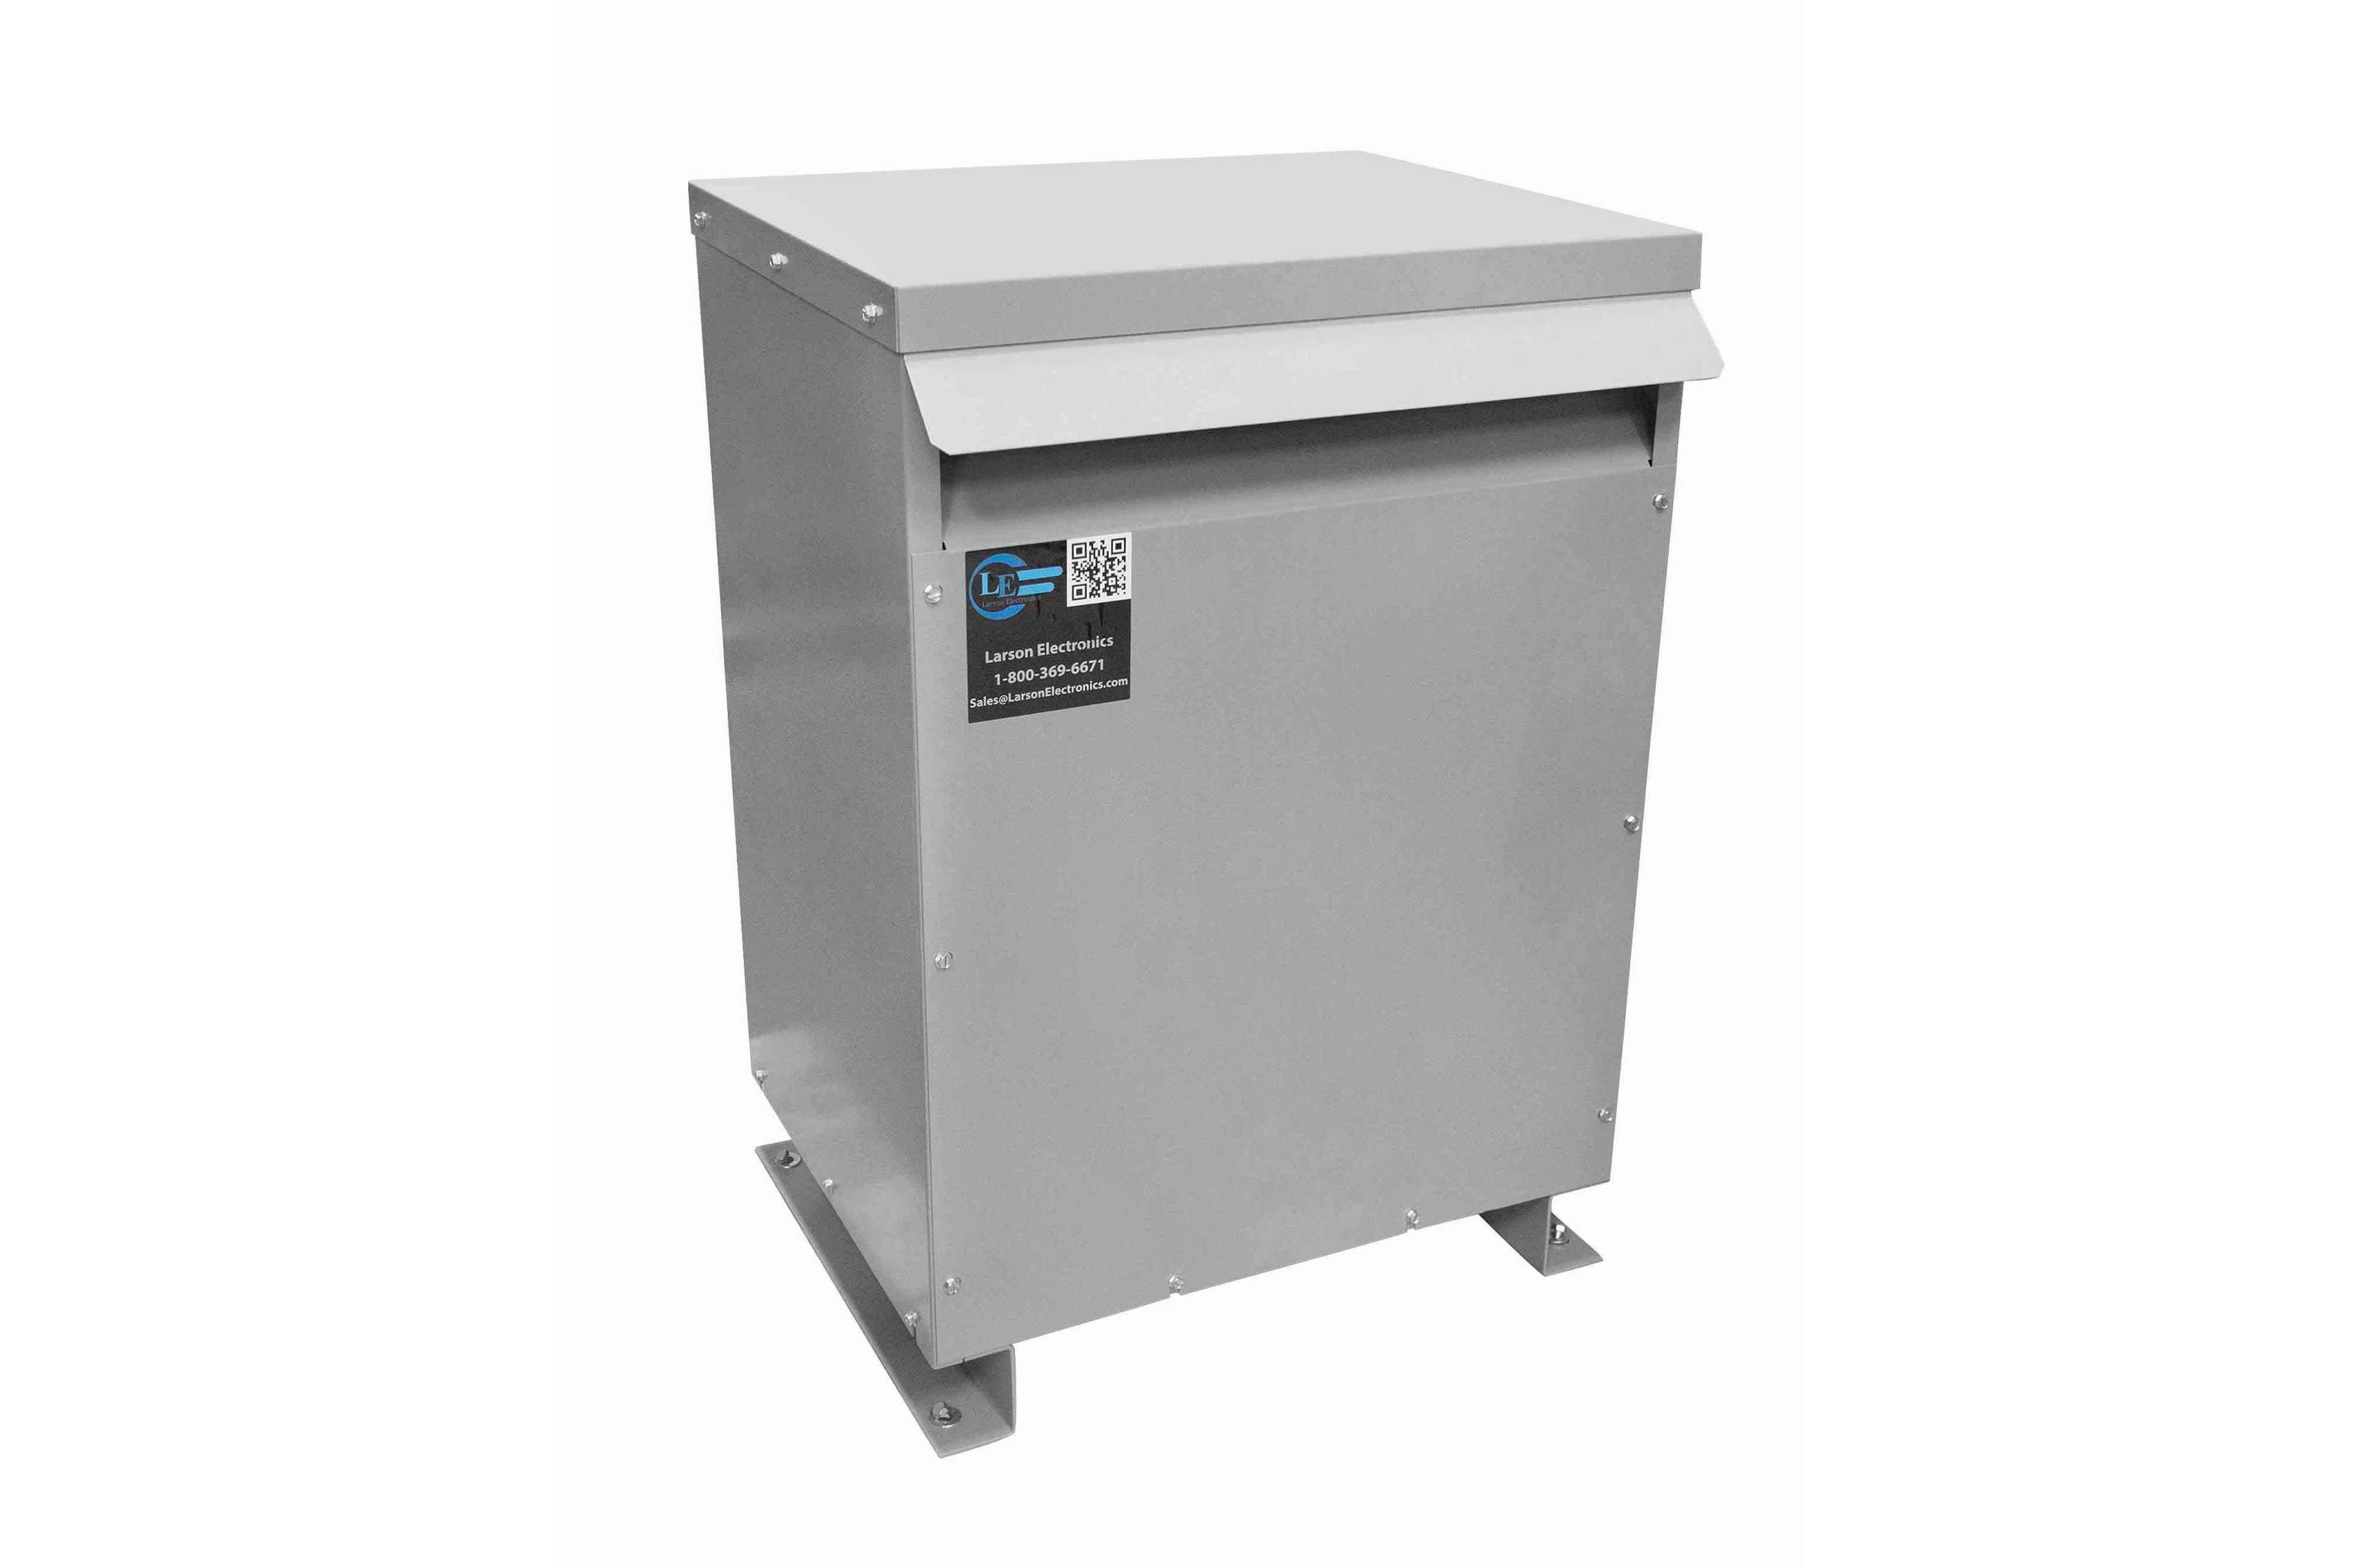 15 kVA 3PH Isolation Transformer, 440V Wye Primary, 240V Delta Secondary, N3R, Ventilated, 60 Hz